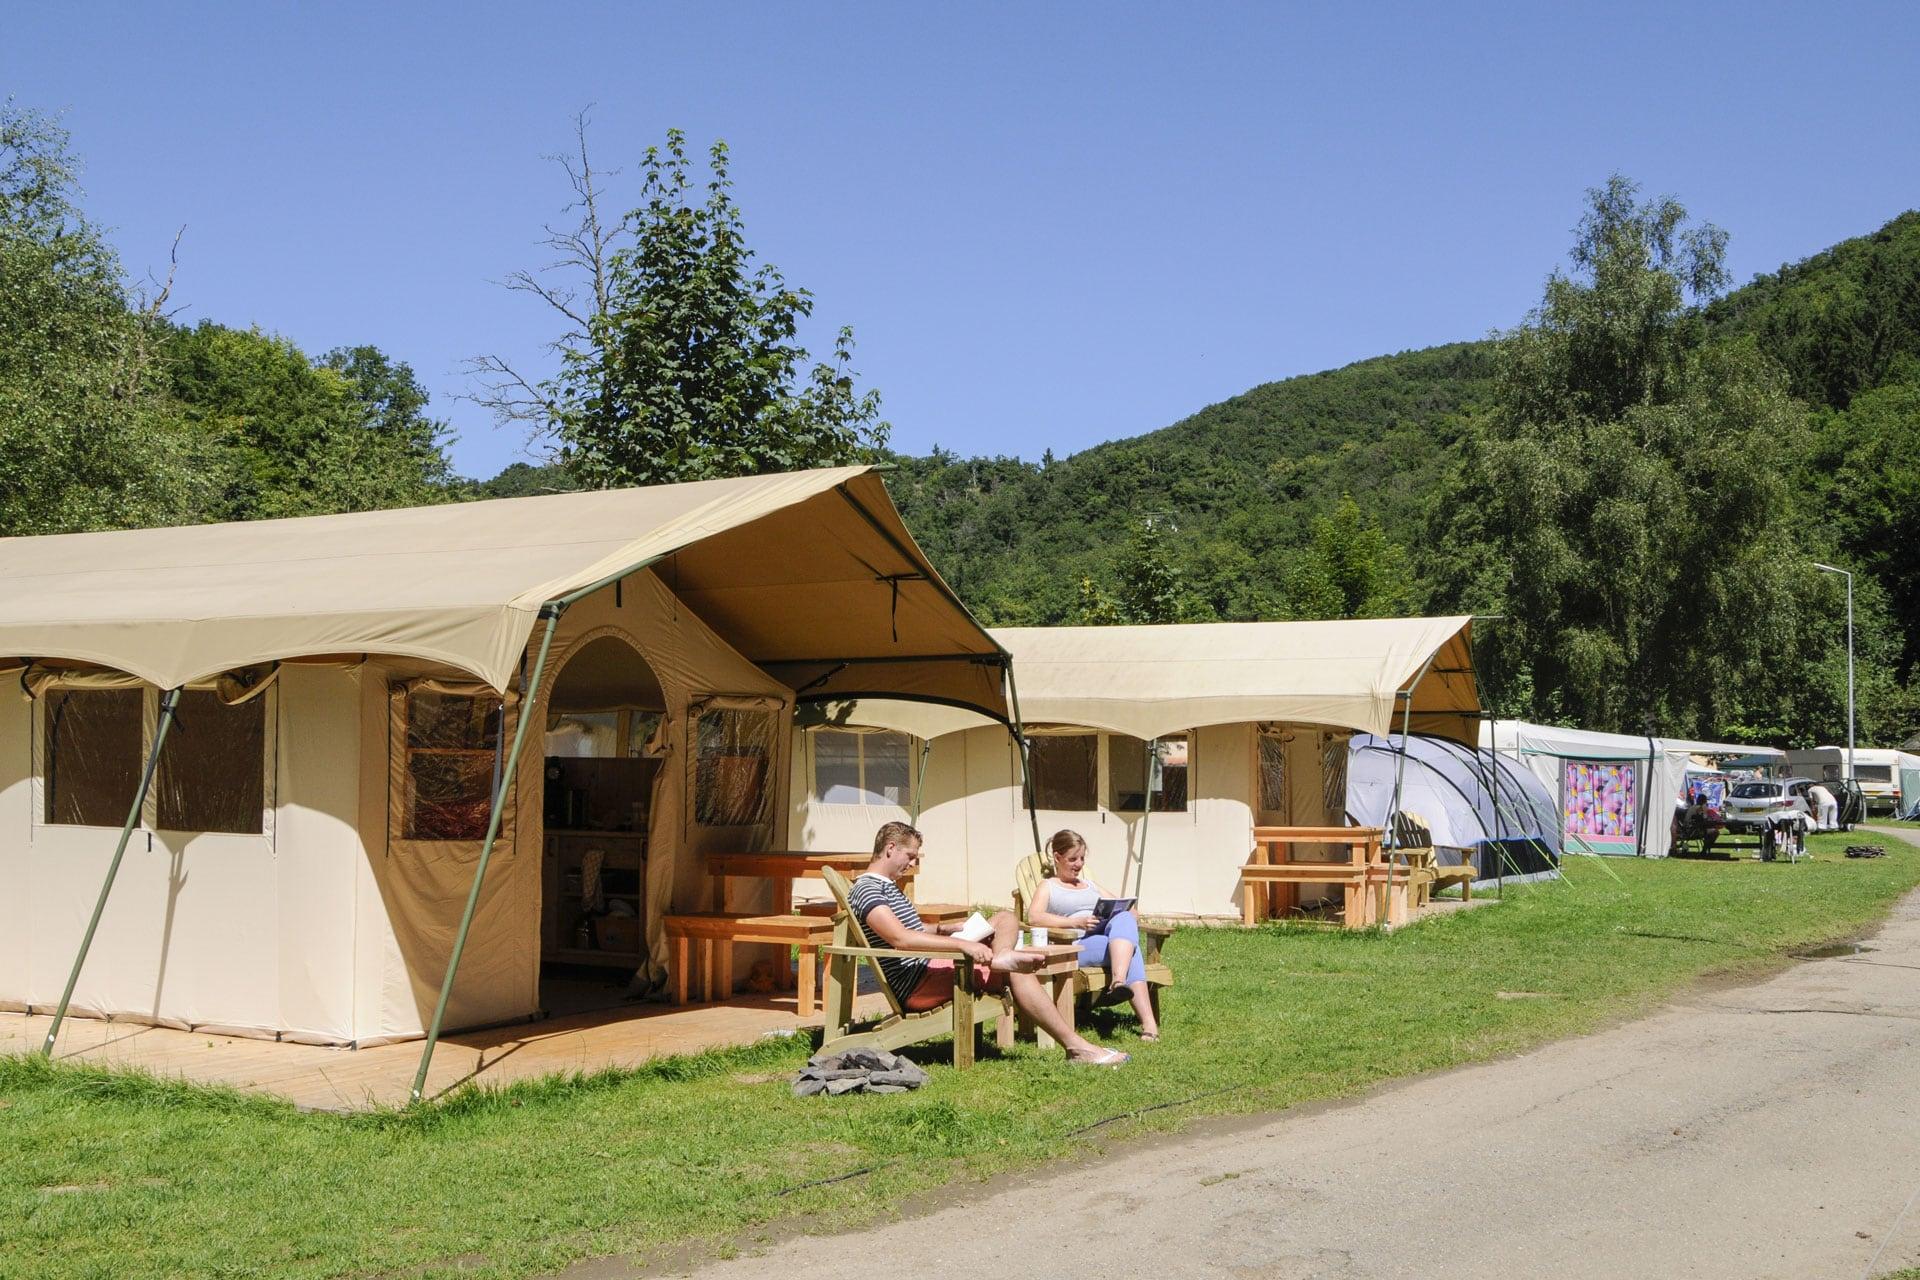 Mietobjekte - Camping Kautenbach